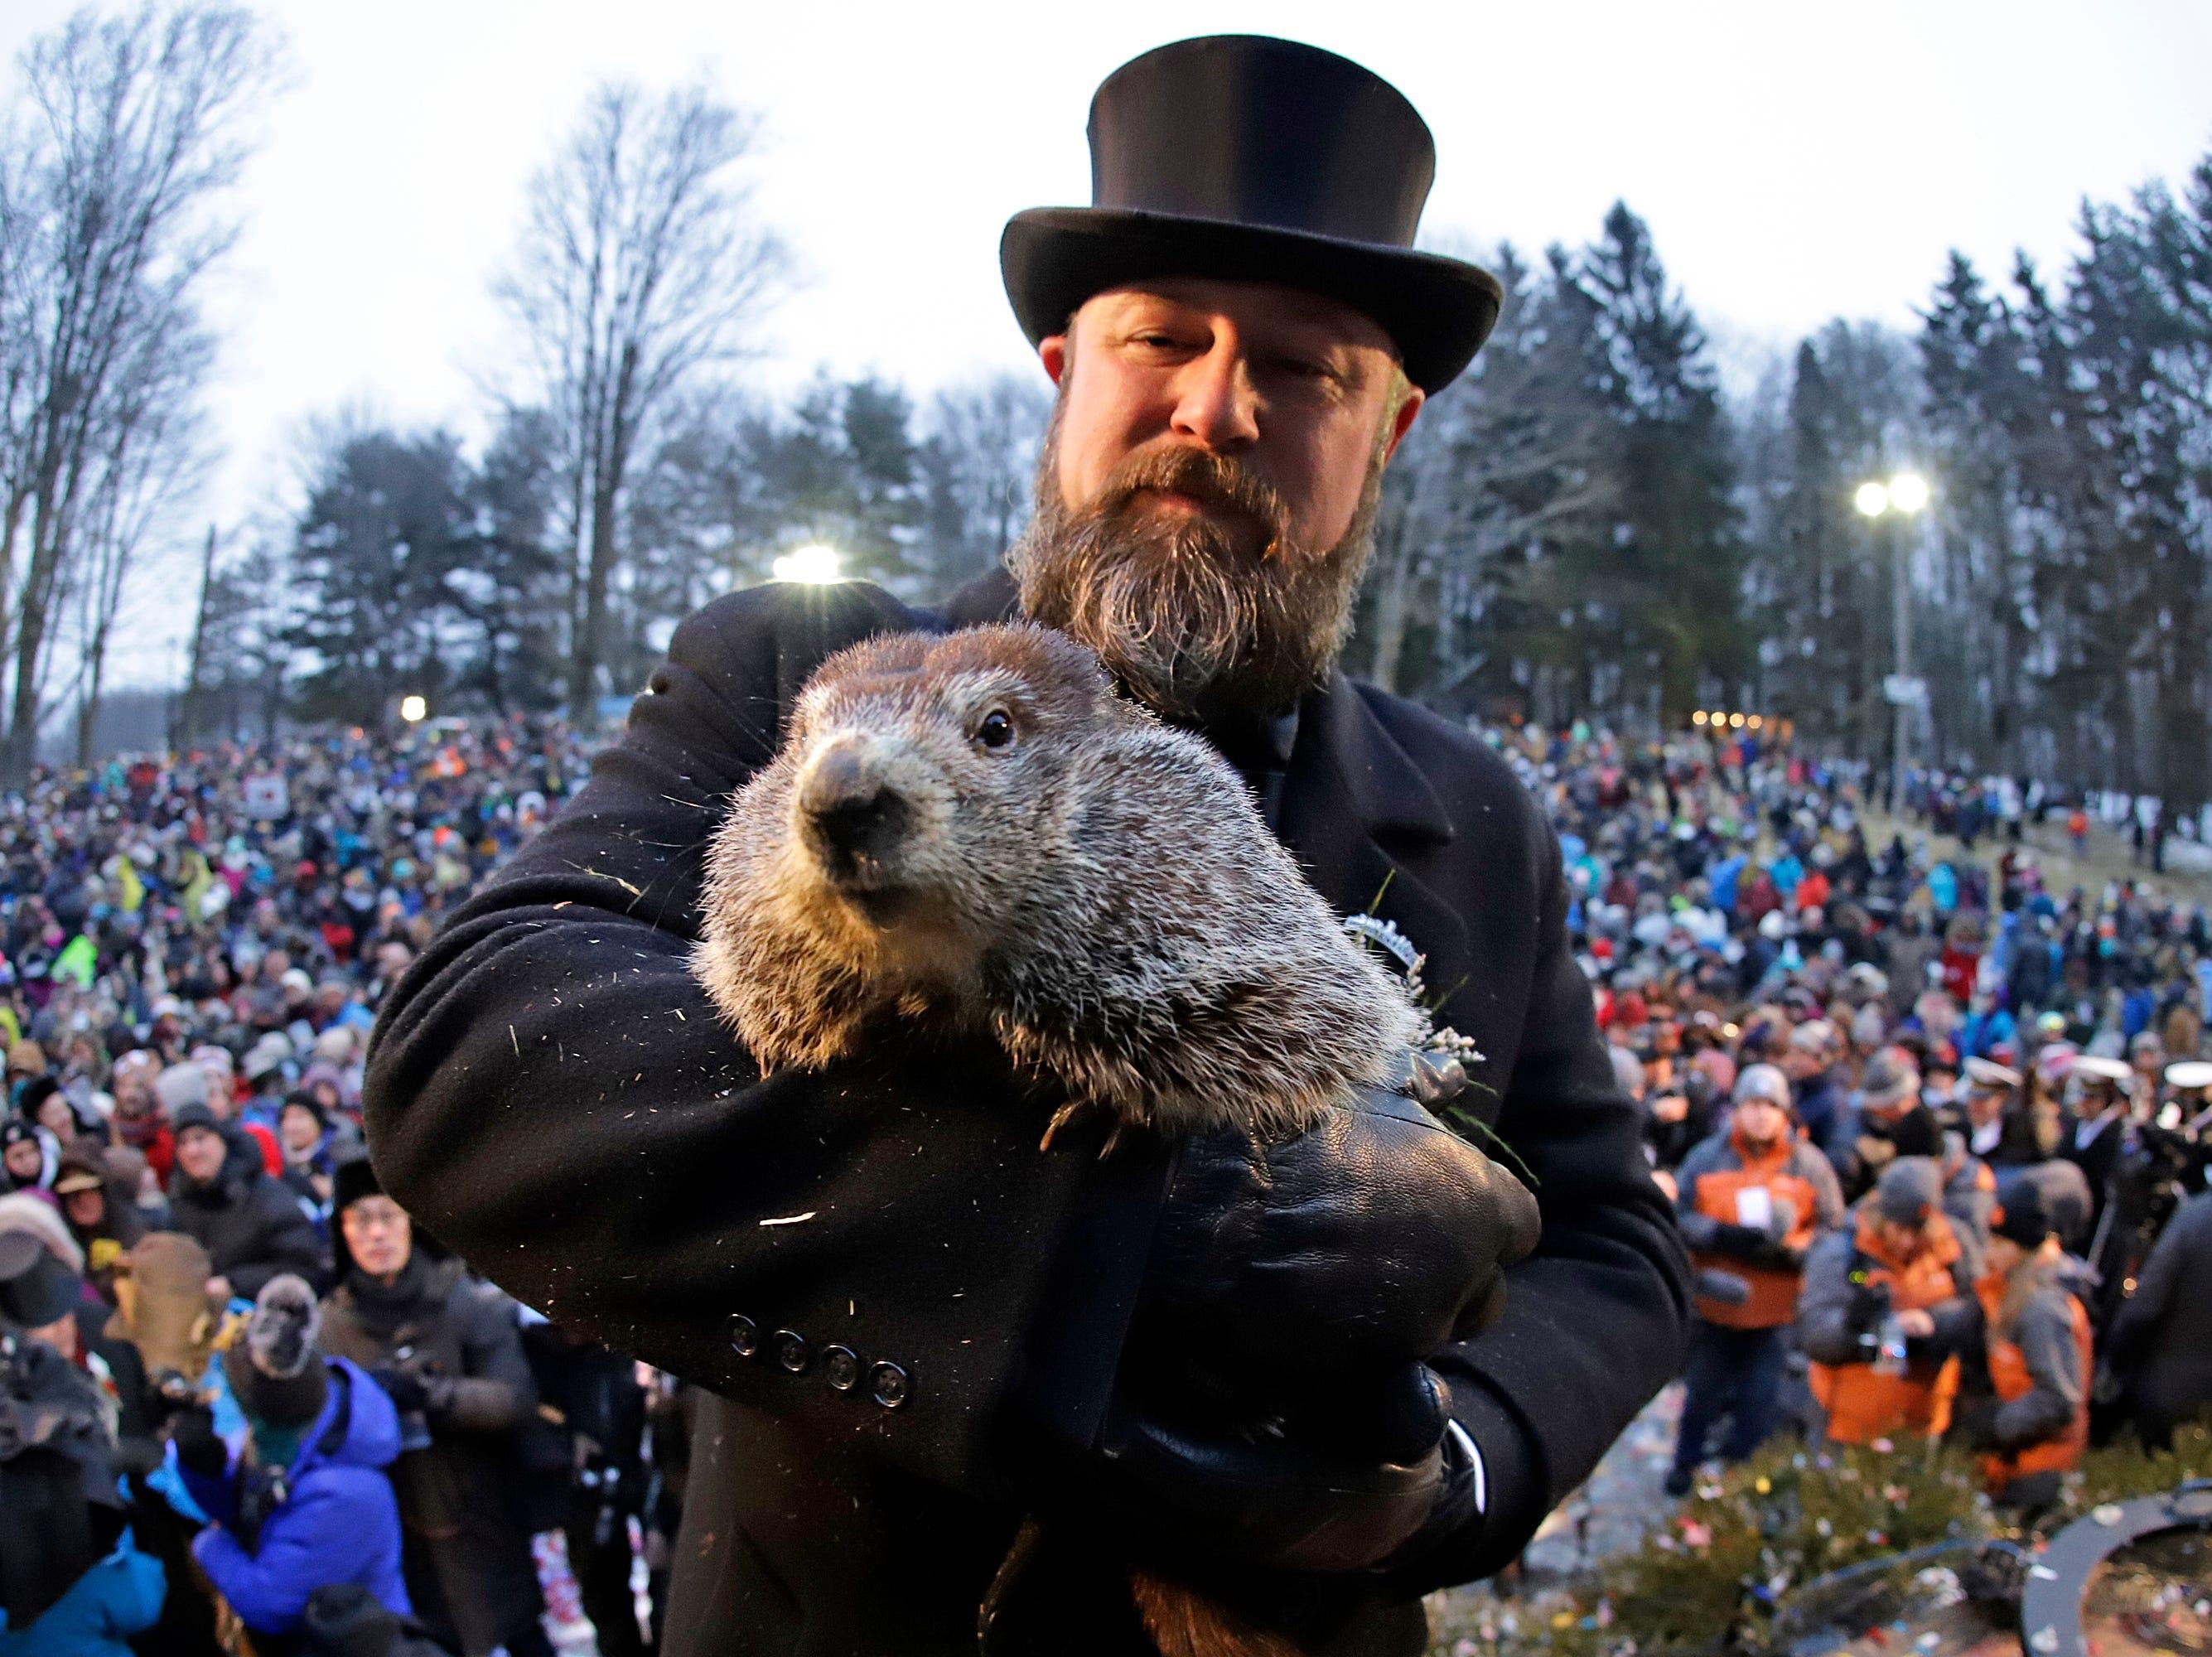 Groundhog Club co-handler Al Dereume, right, holds Punxsutawney Phil, the weather prognosticating groundhog, during the 133rd celebration of Groundhog Day on Gobbler's Knob in Punxsutawney, Pa. Saturday, Feb. 2, 2019. Phil's handlers said that the groundhog has forecast an early spring. (AP Photo/Gene J. Puskar)